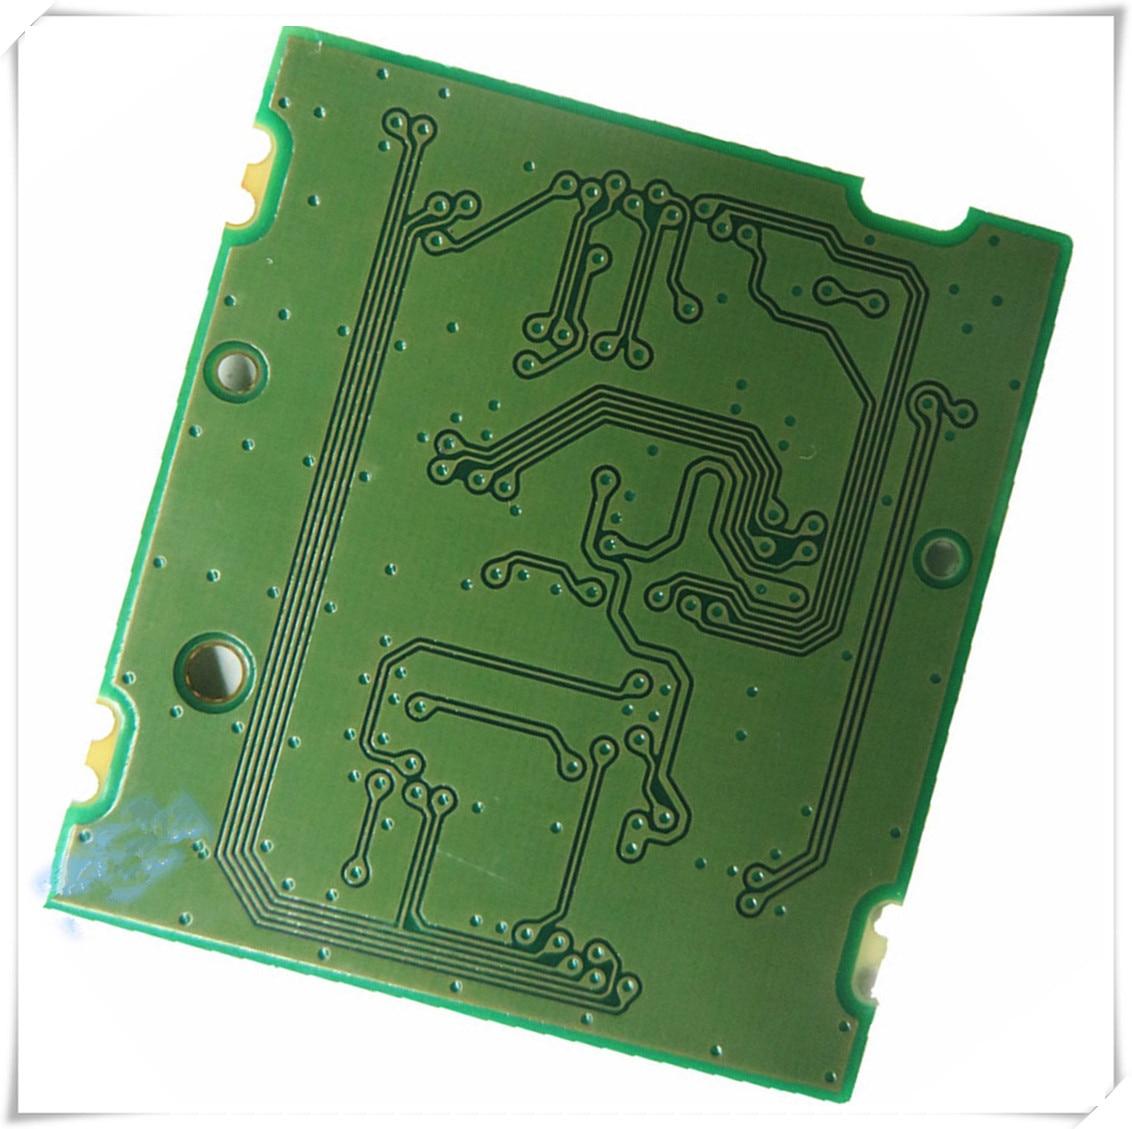 Board Camera Wiring Diagram Expert Schematics Reversing Circuit Detailed Reverse